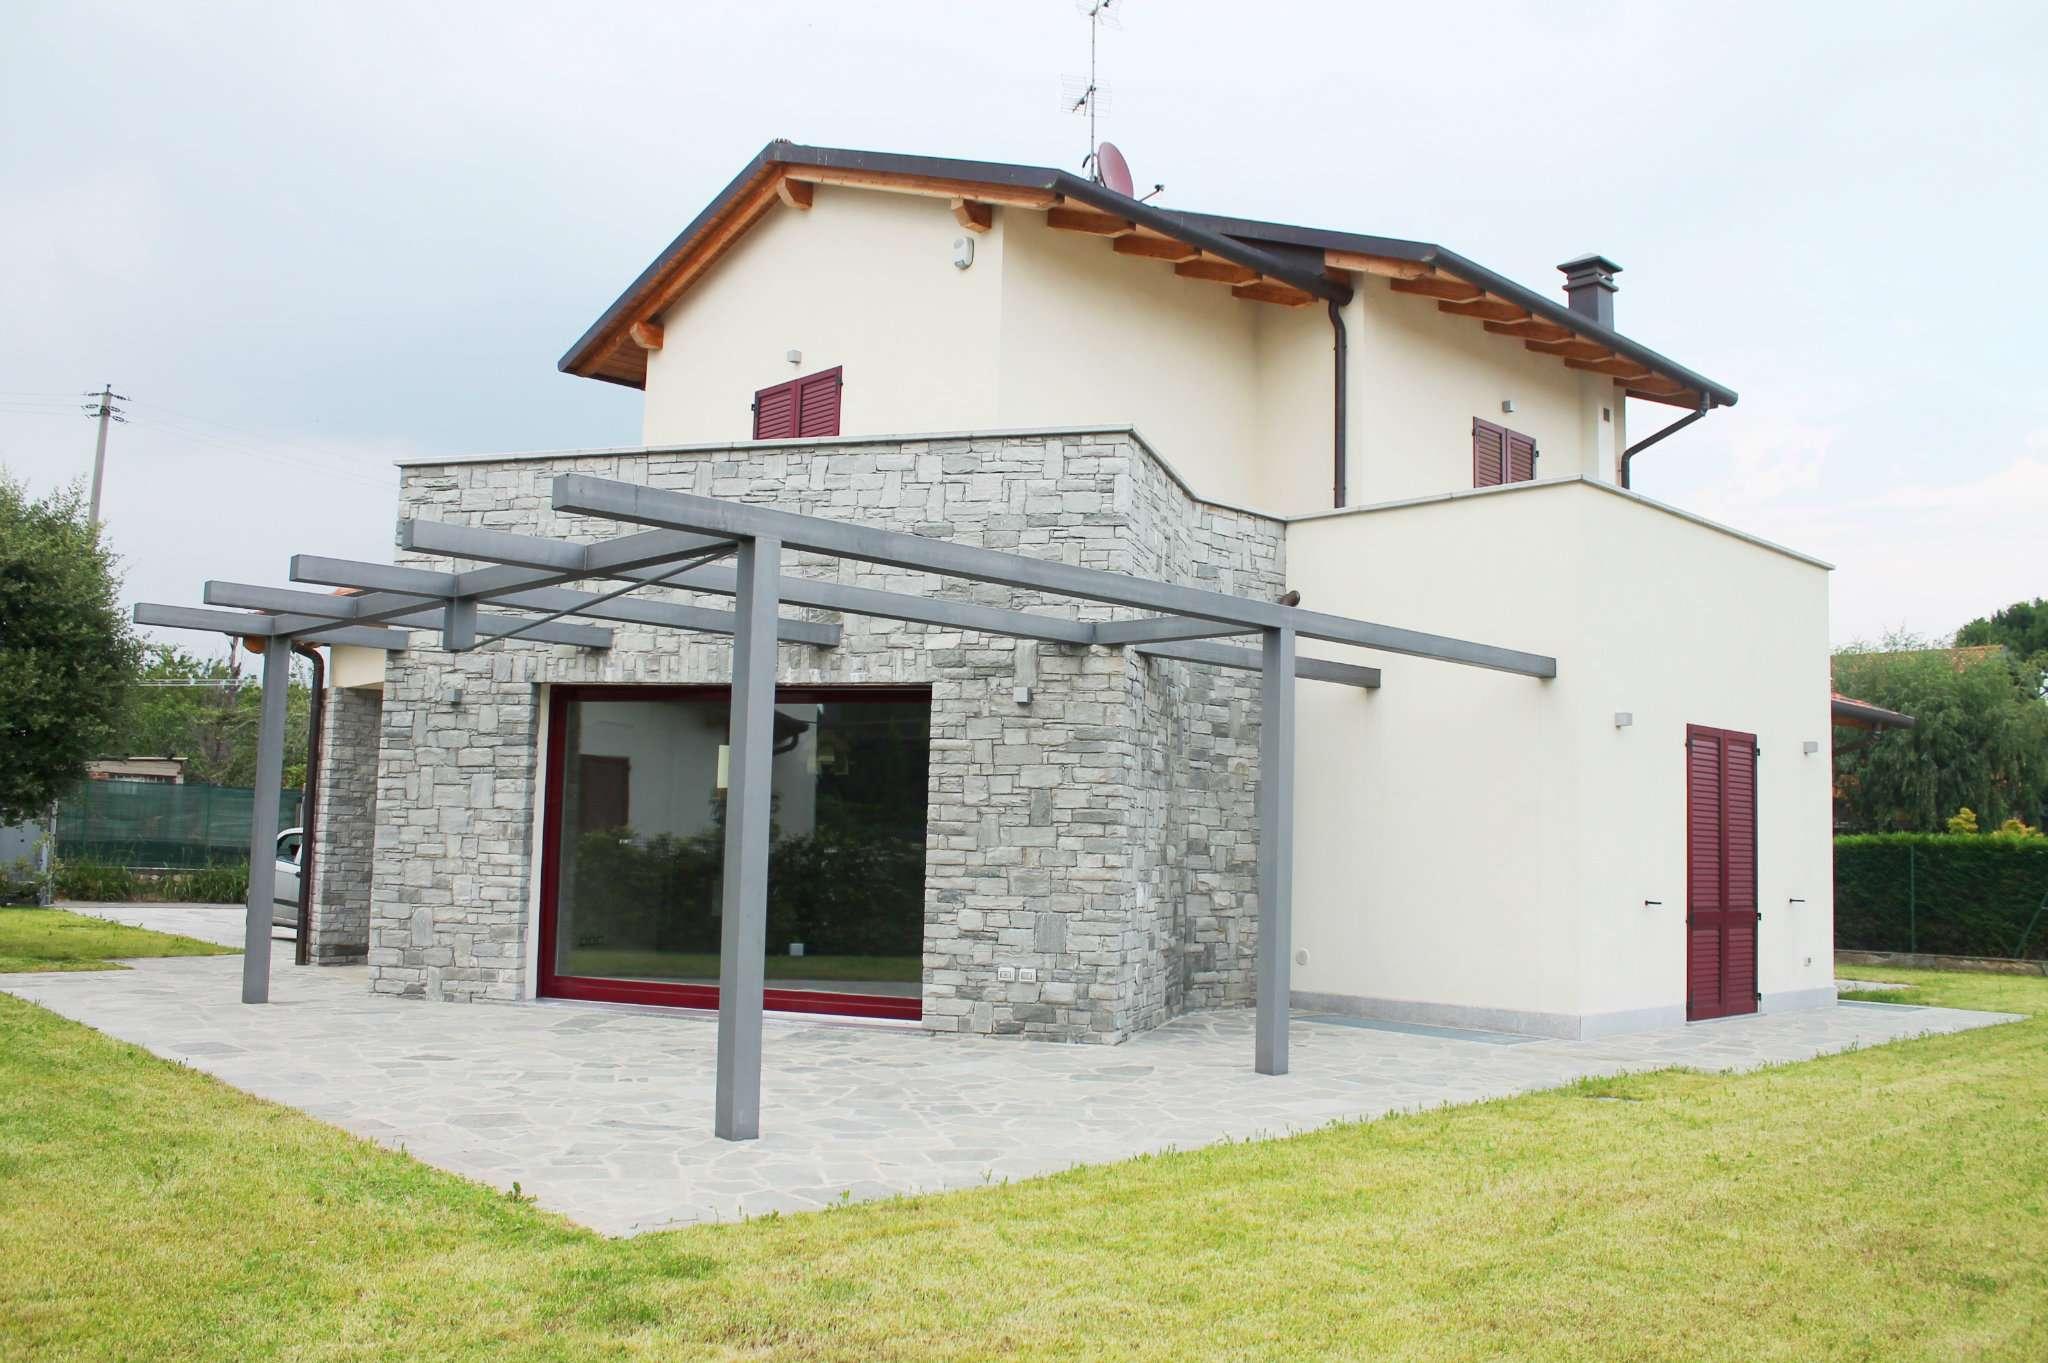 Villa in Vendita a Robbiate: 4 locali, 290 mq